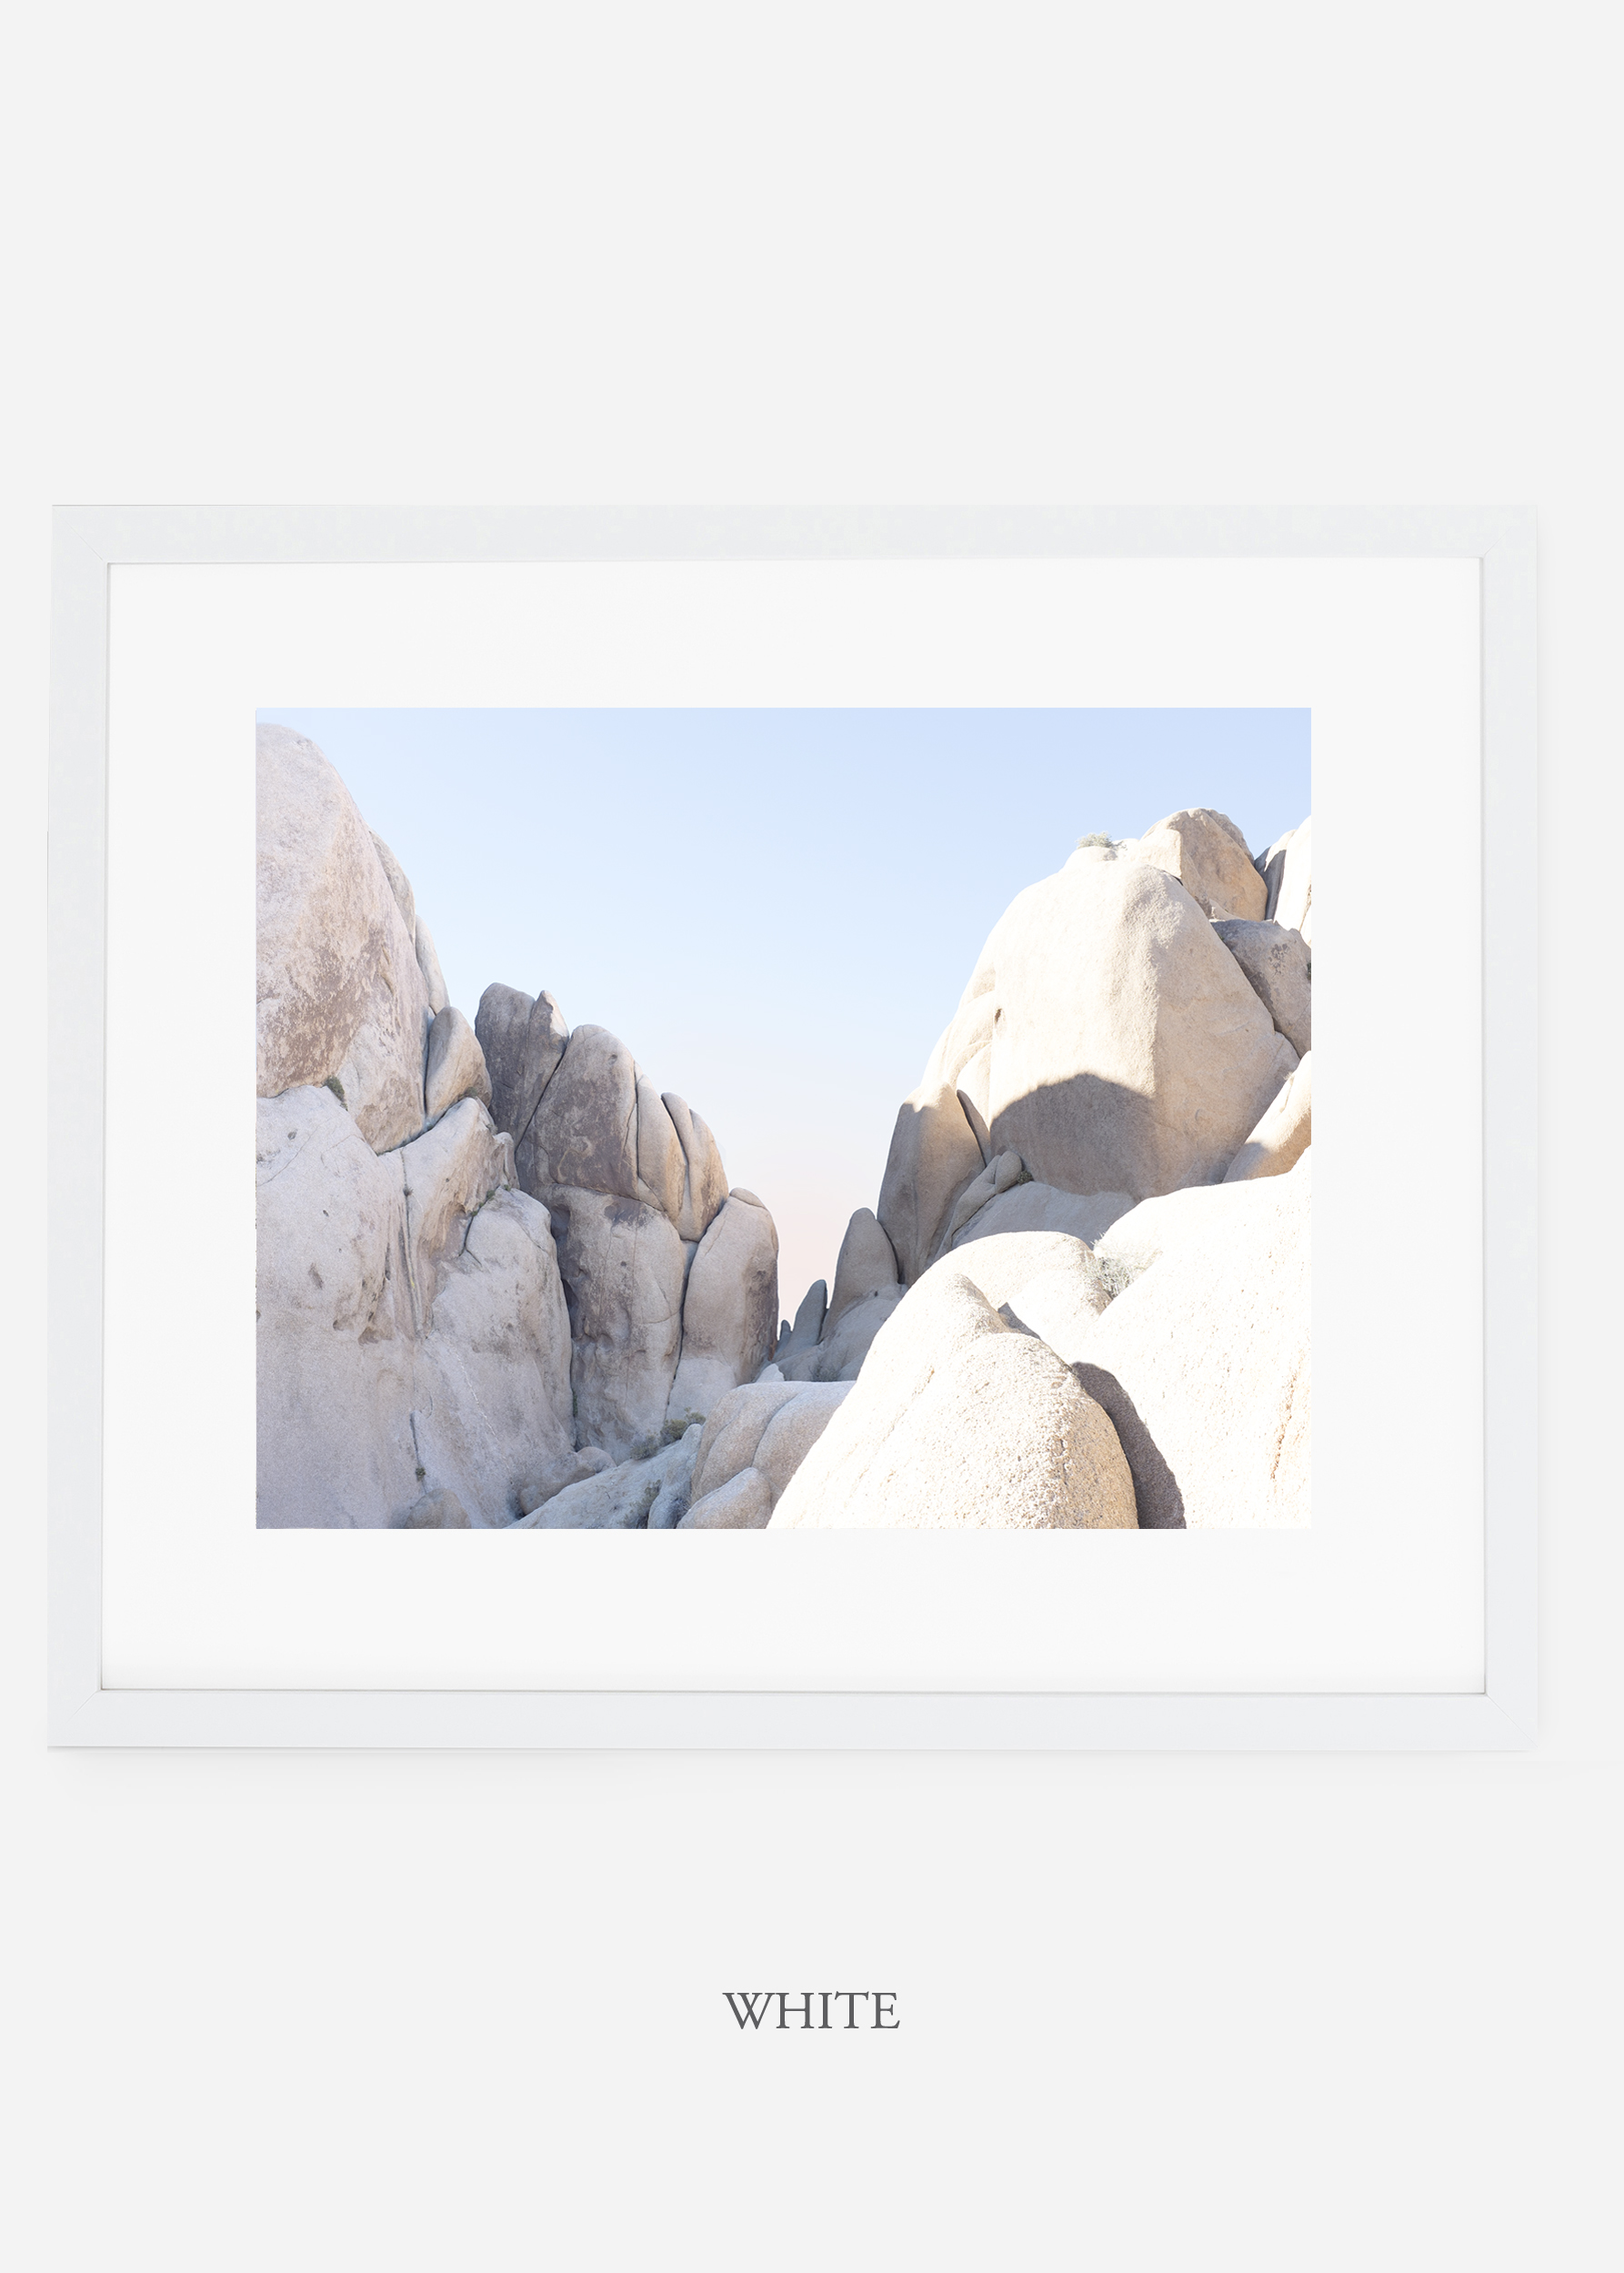 WilderCalifornia_whiteframe_JoshuaTree_No.18_interiordesign_prints_art.jpg